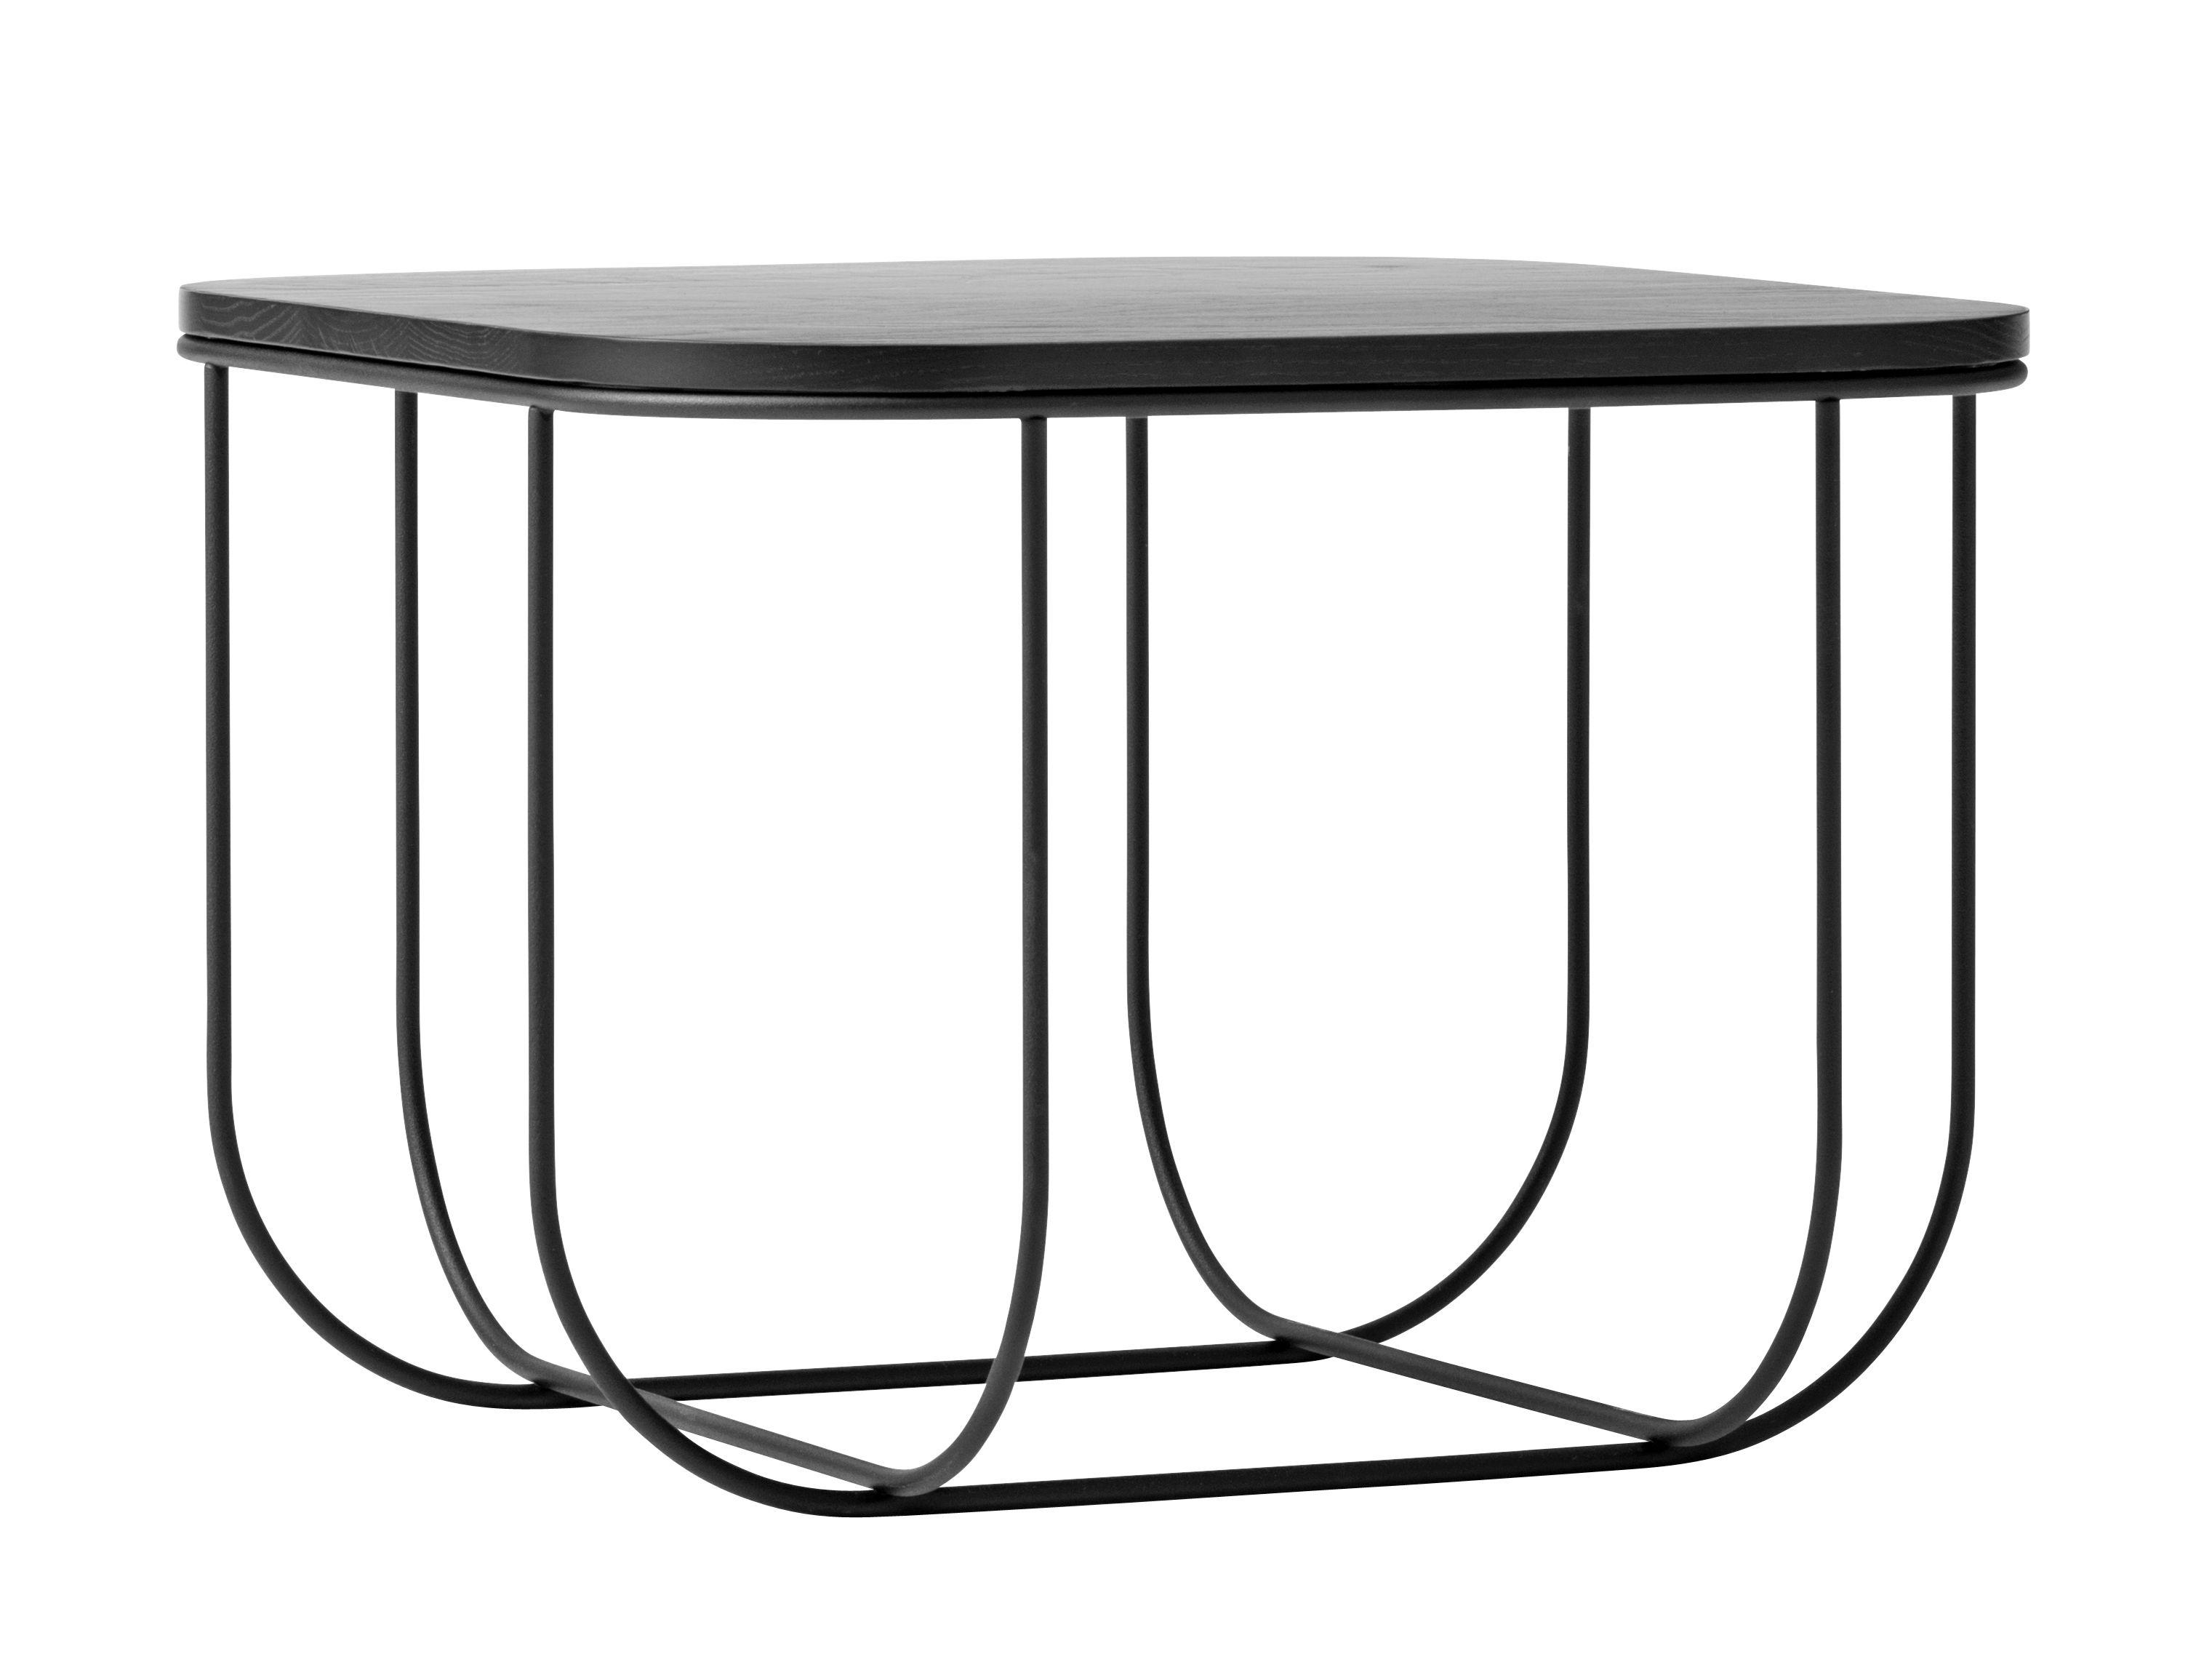 Cage Coffee table Storage H 30 cm Black by Menu